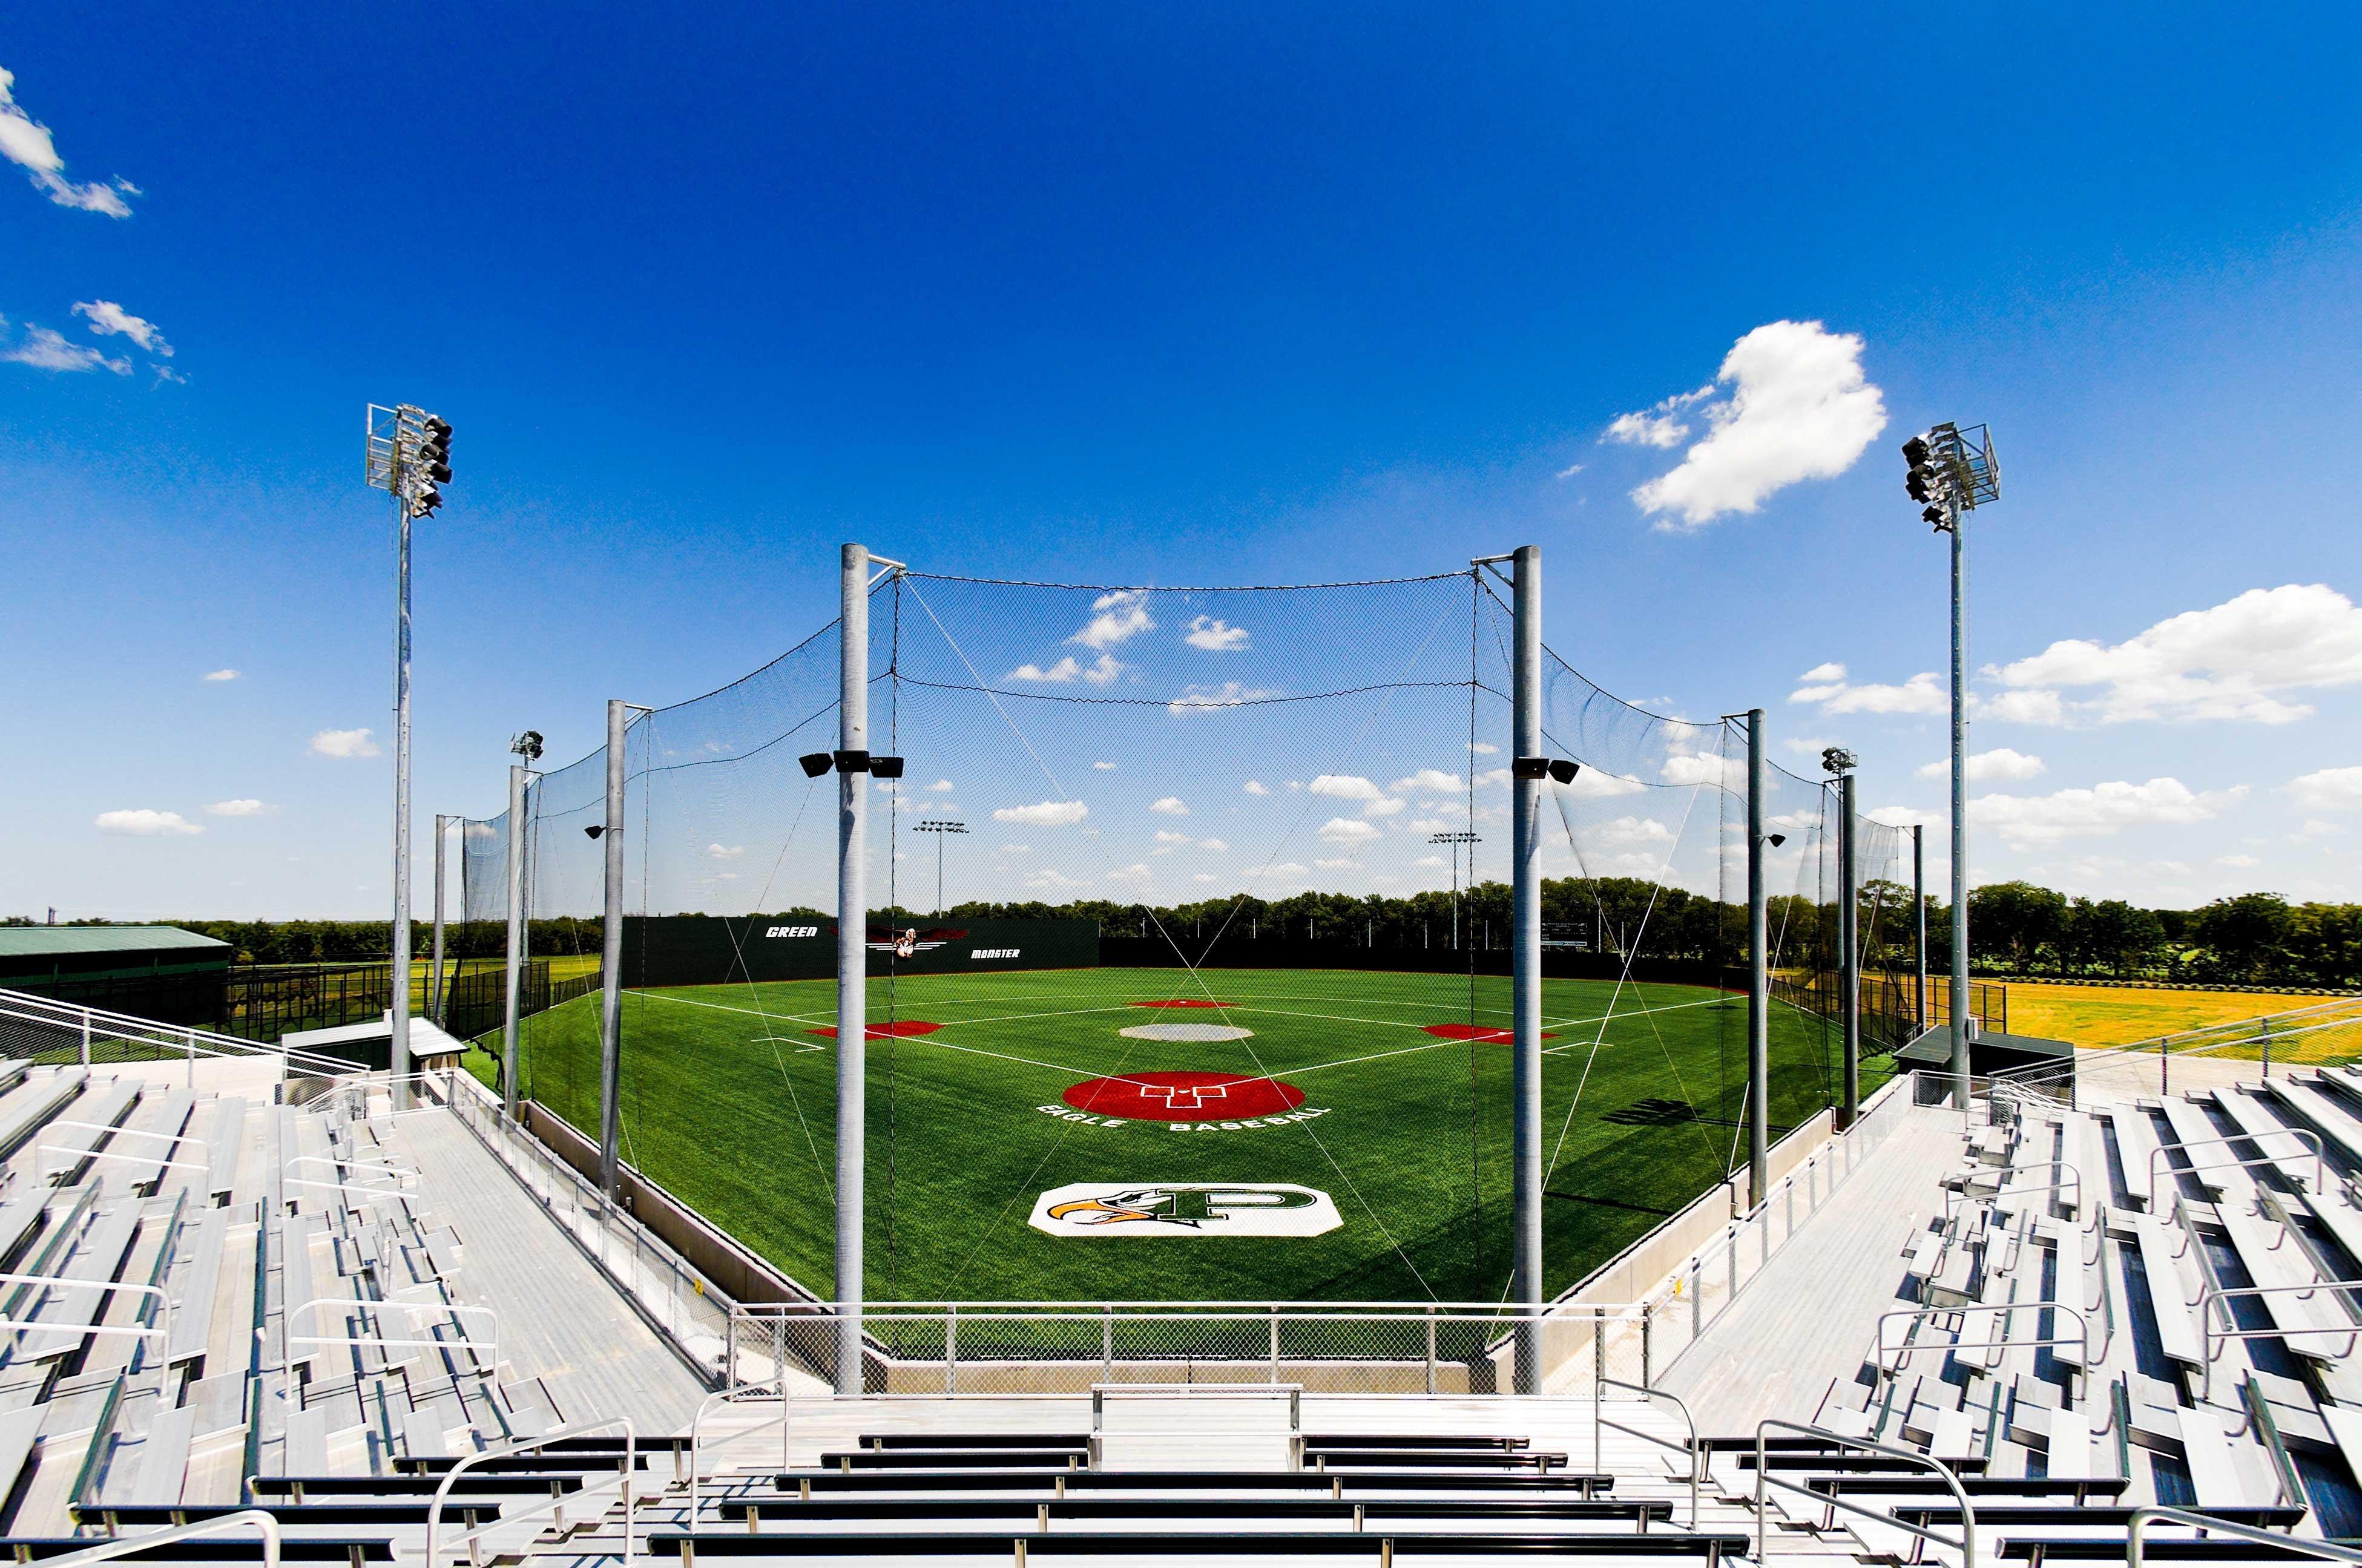 Prosper High School Baseball Field